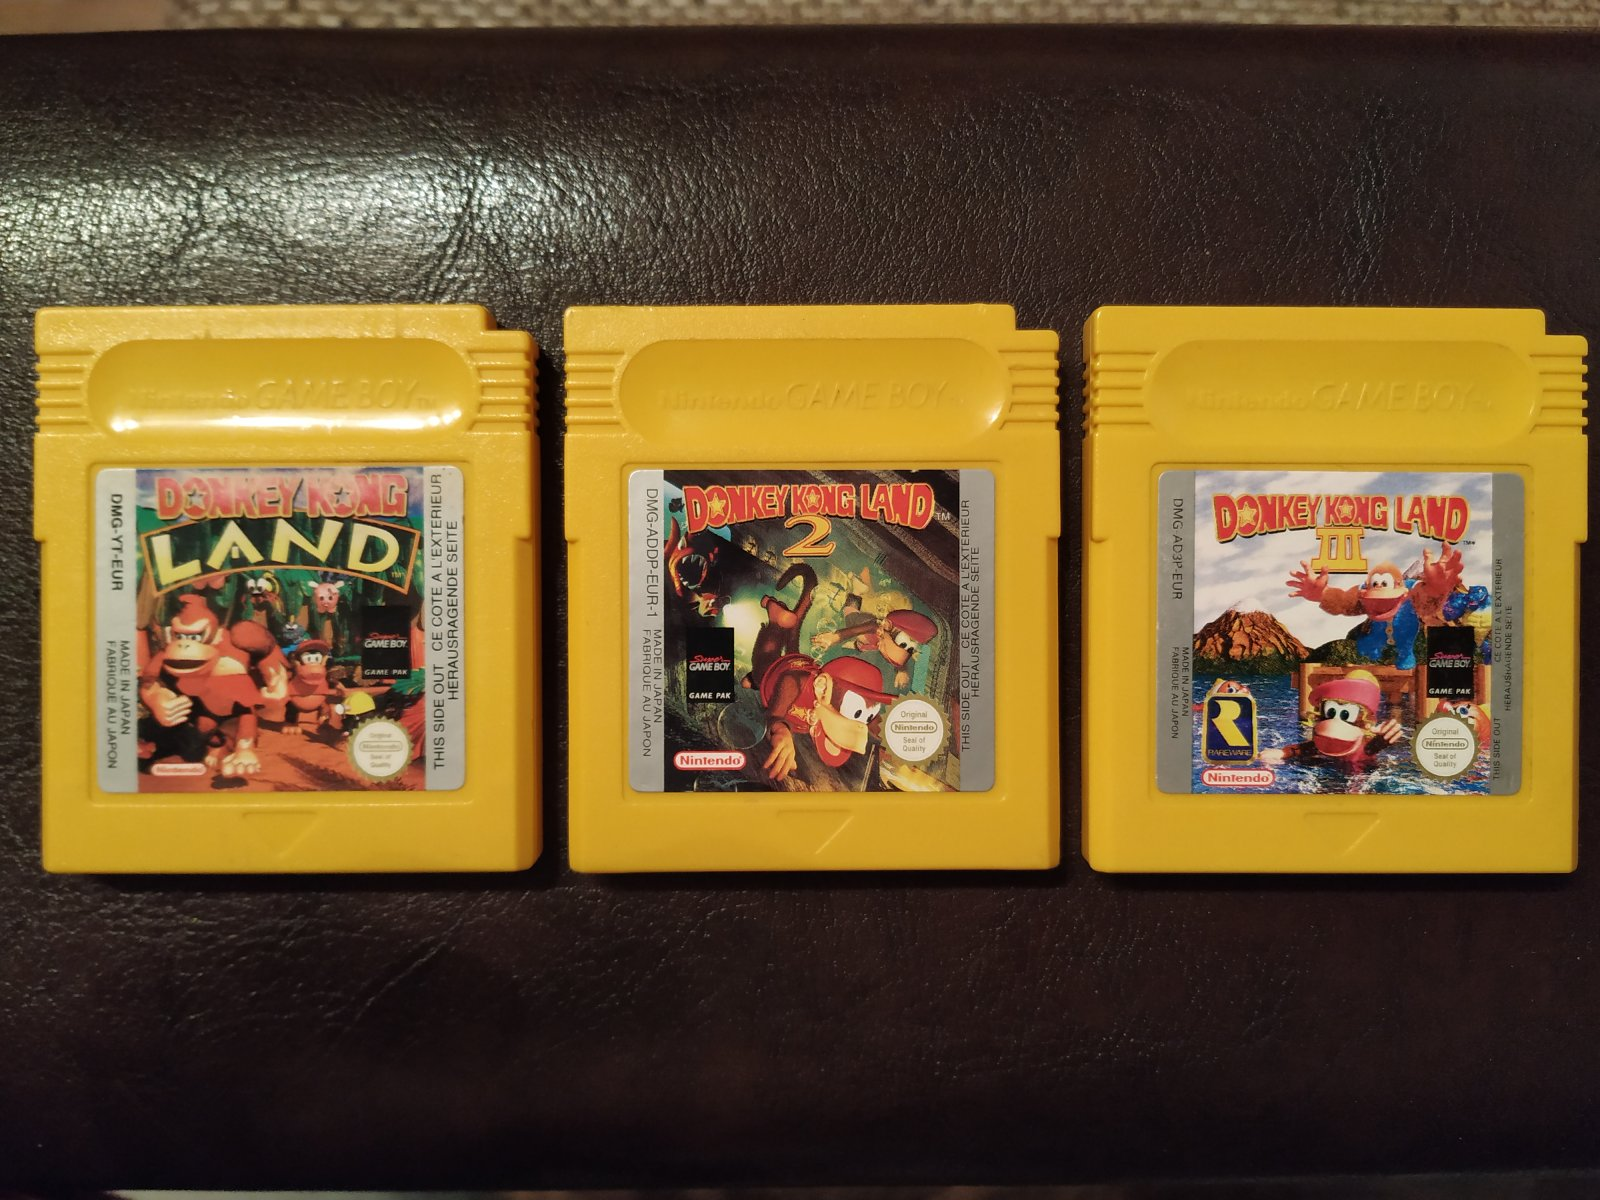 Donkey Kong Land kolekcija